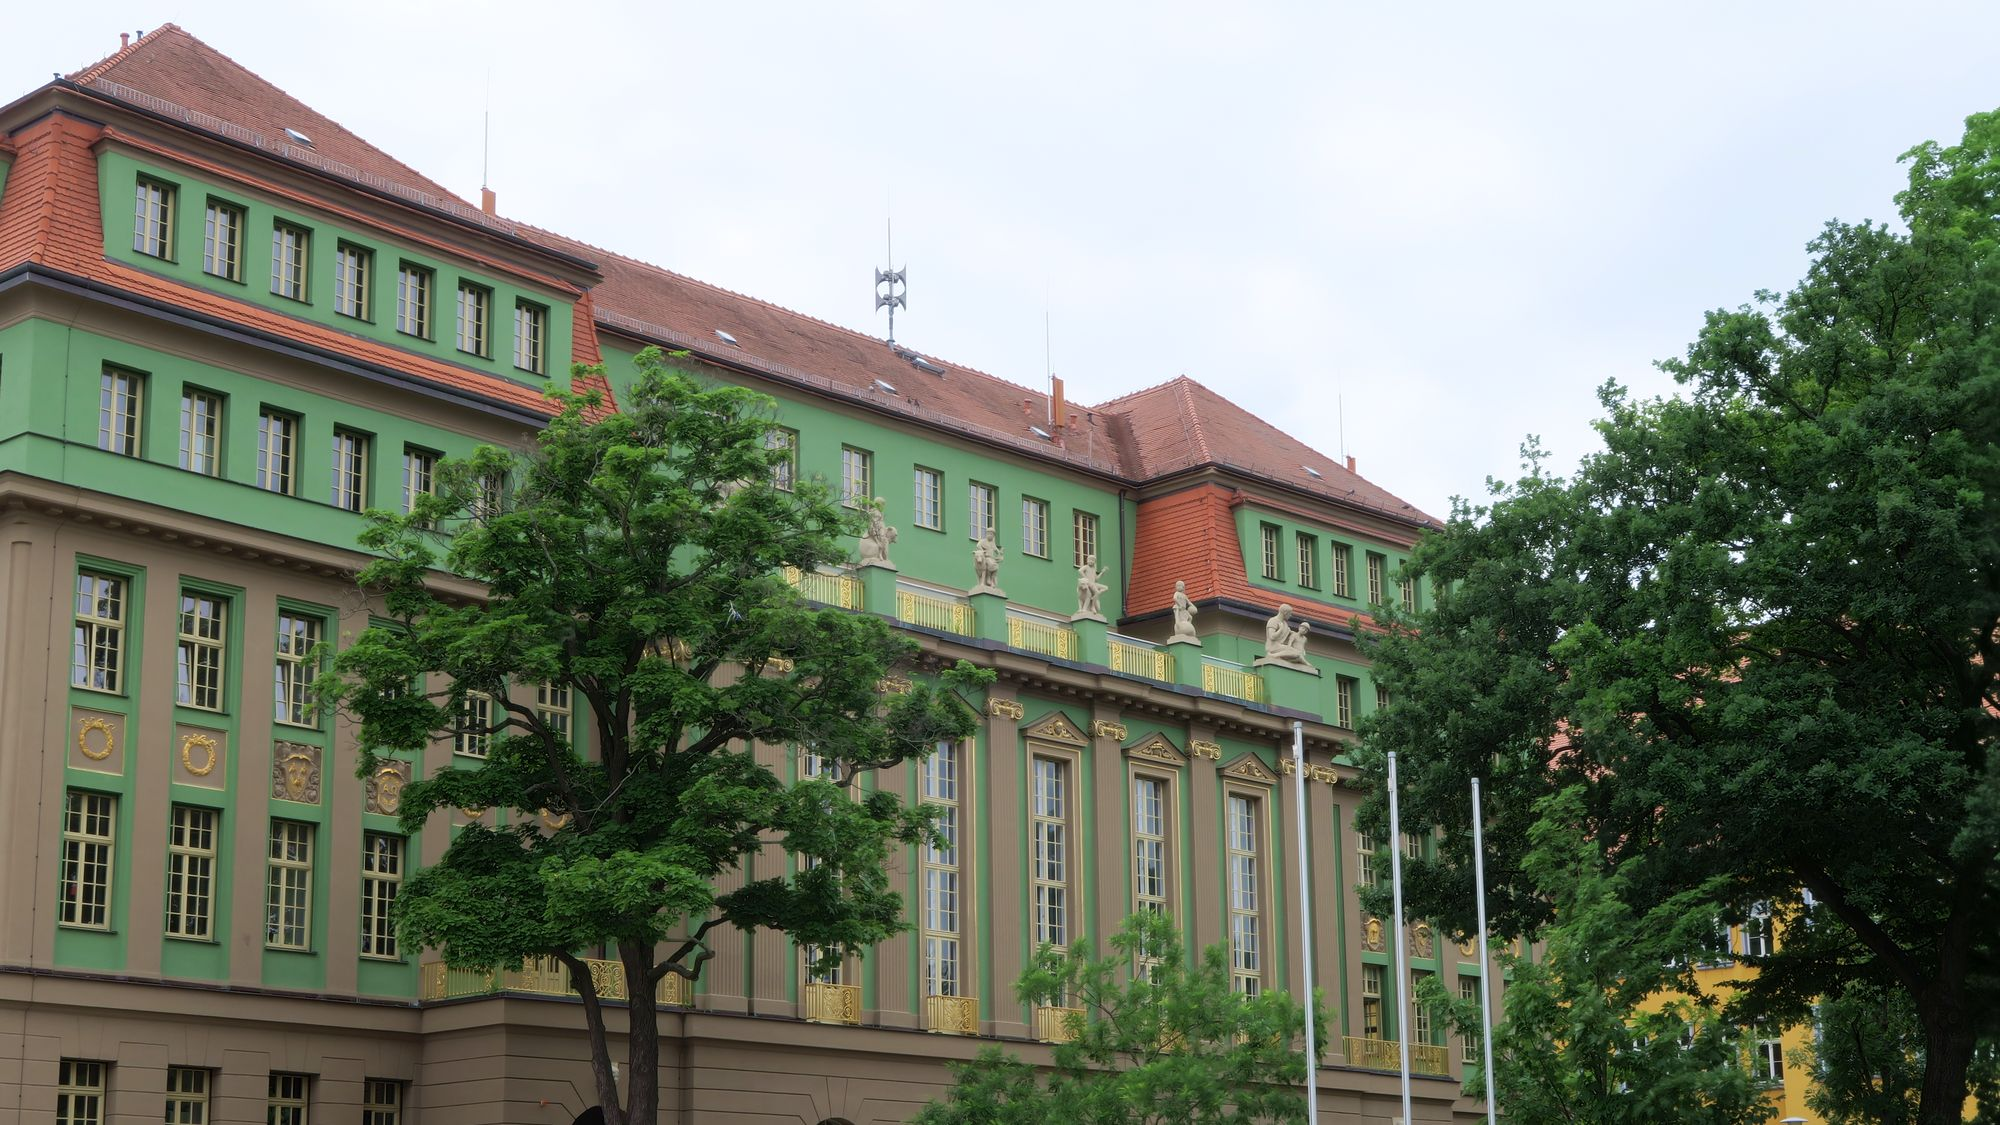 Sirene auf dem Romain-Rolland-Gymnasium